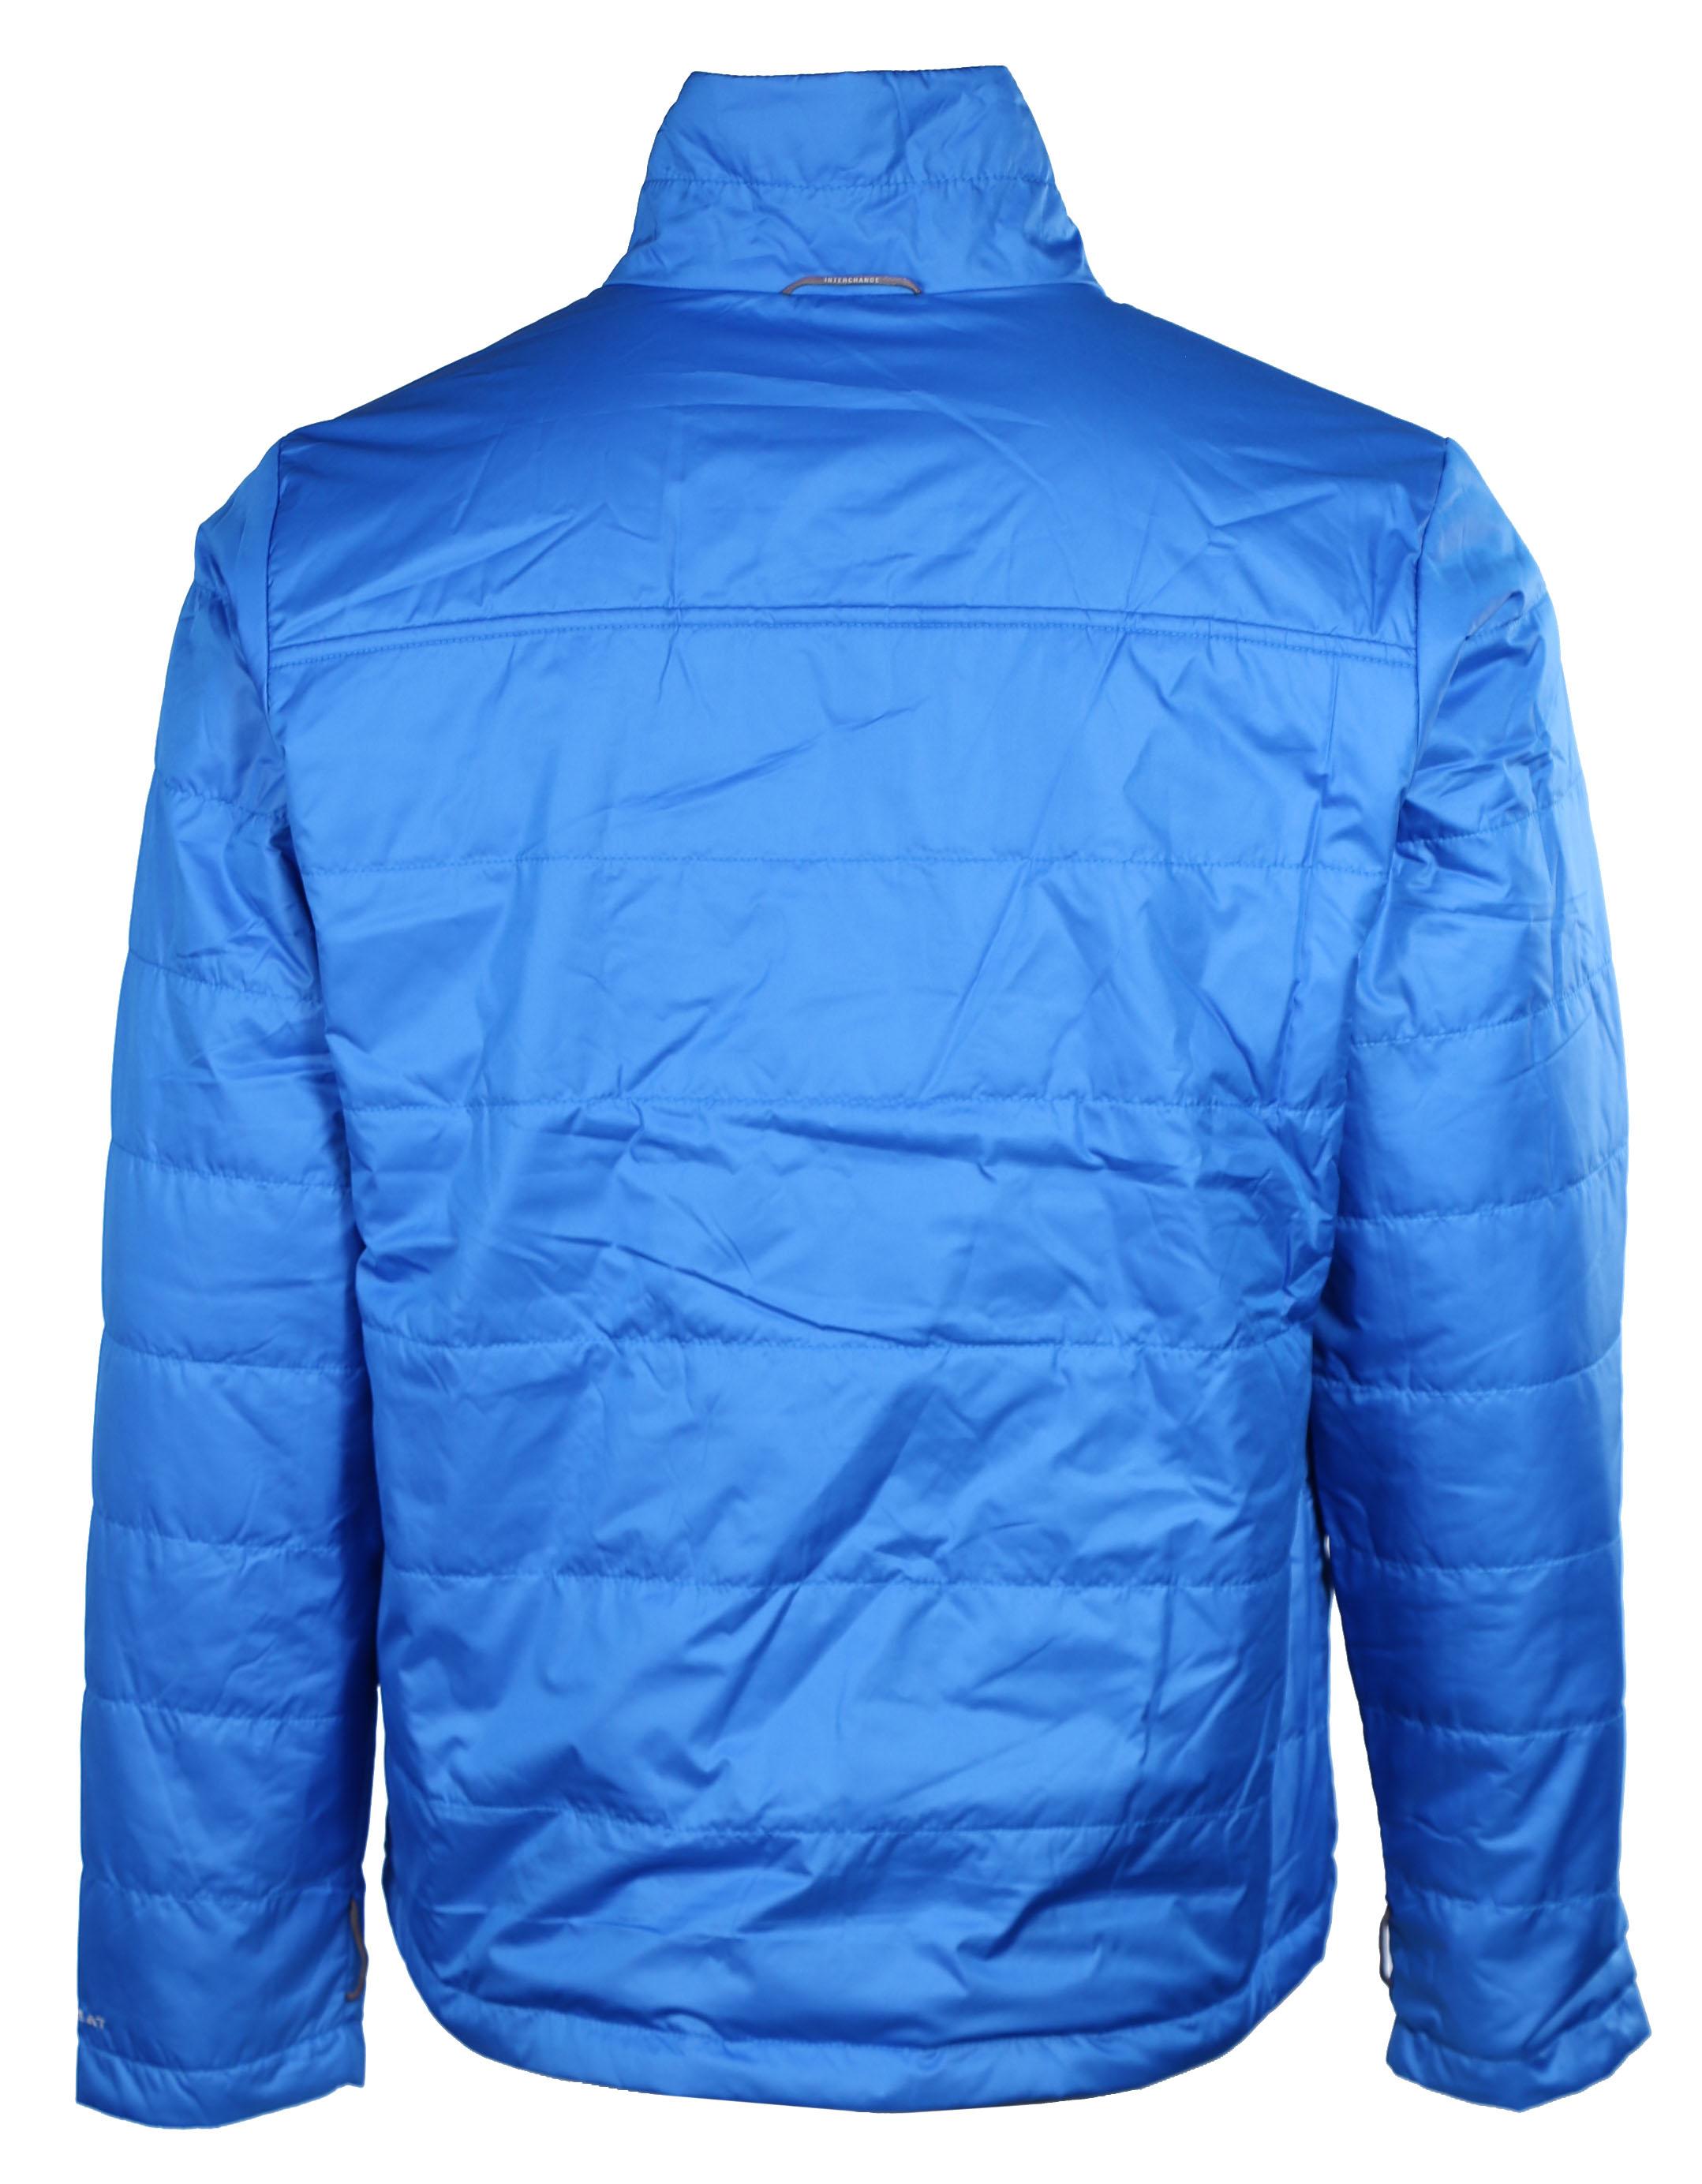 Columbia women's core interchange jacket